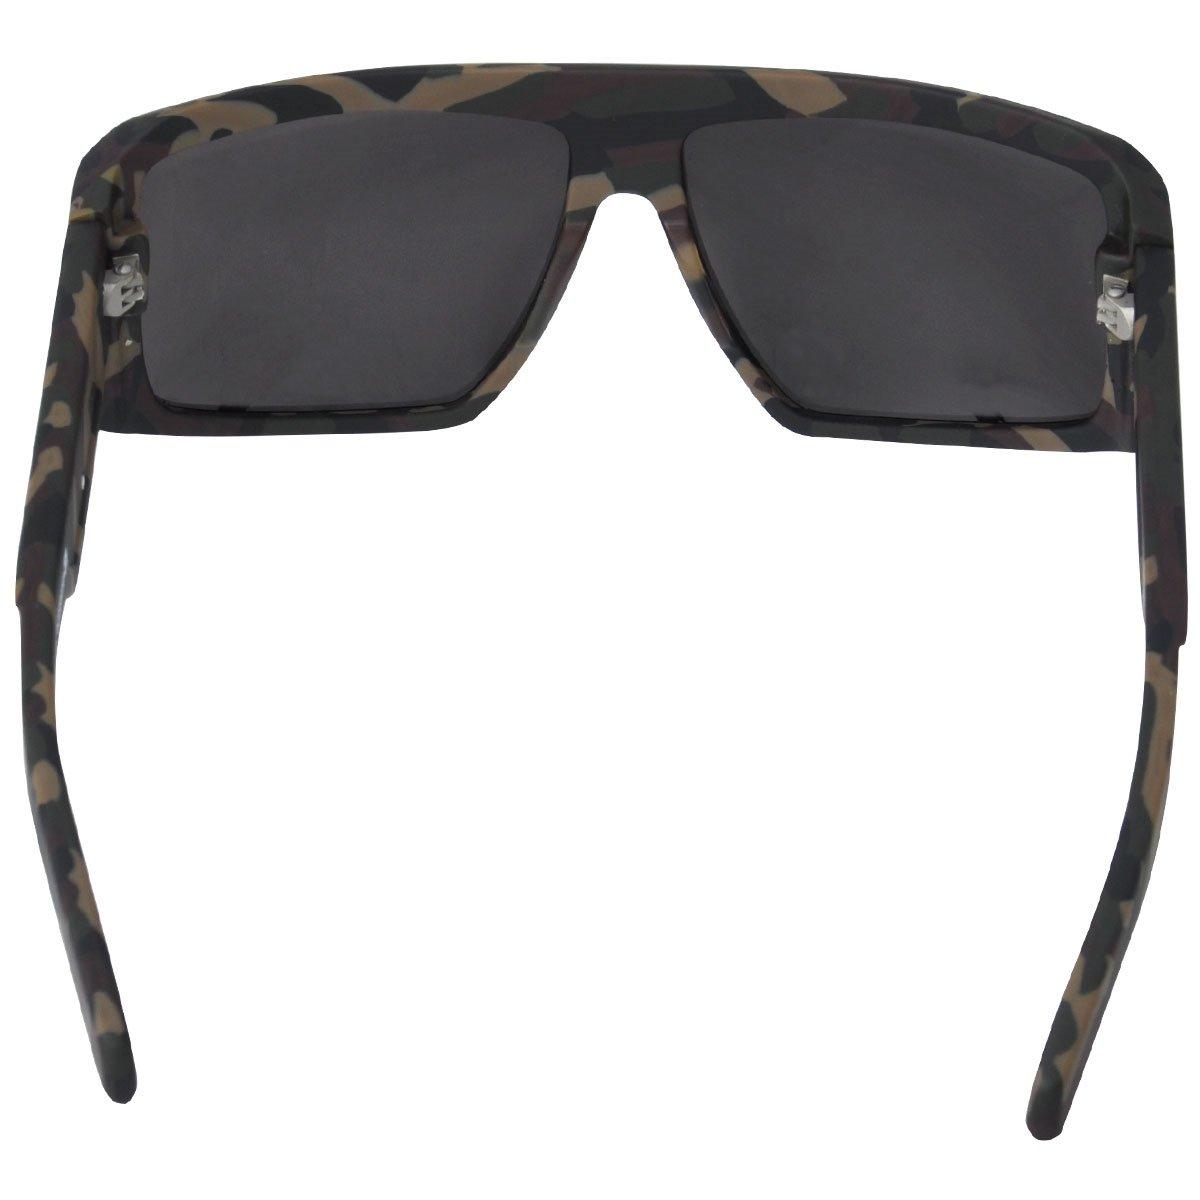 Óculos Quiksilver The Empire - Compre Agora   Netshoes 92b3d2af96